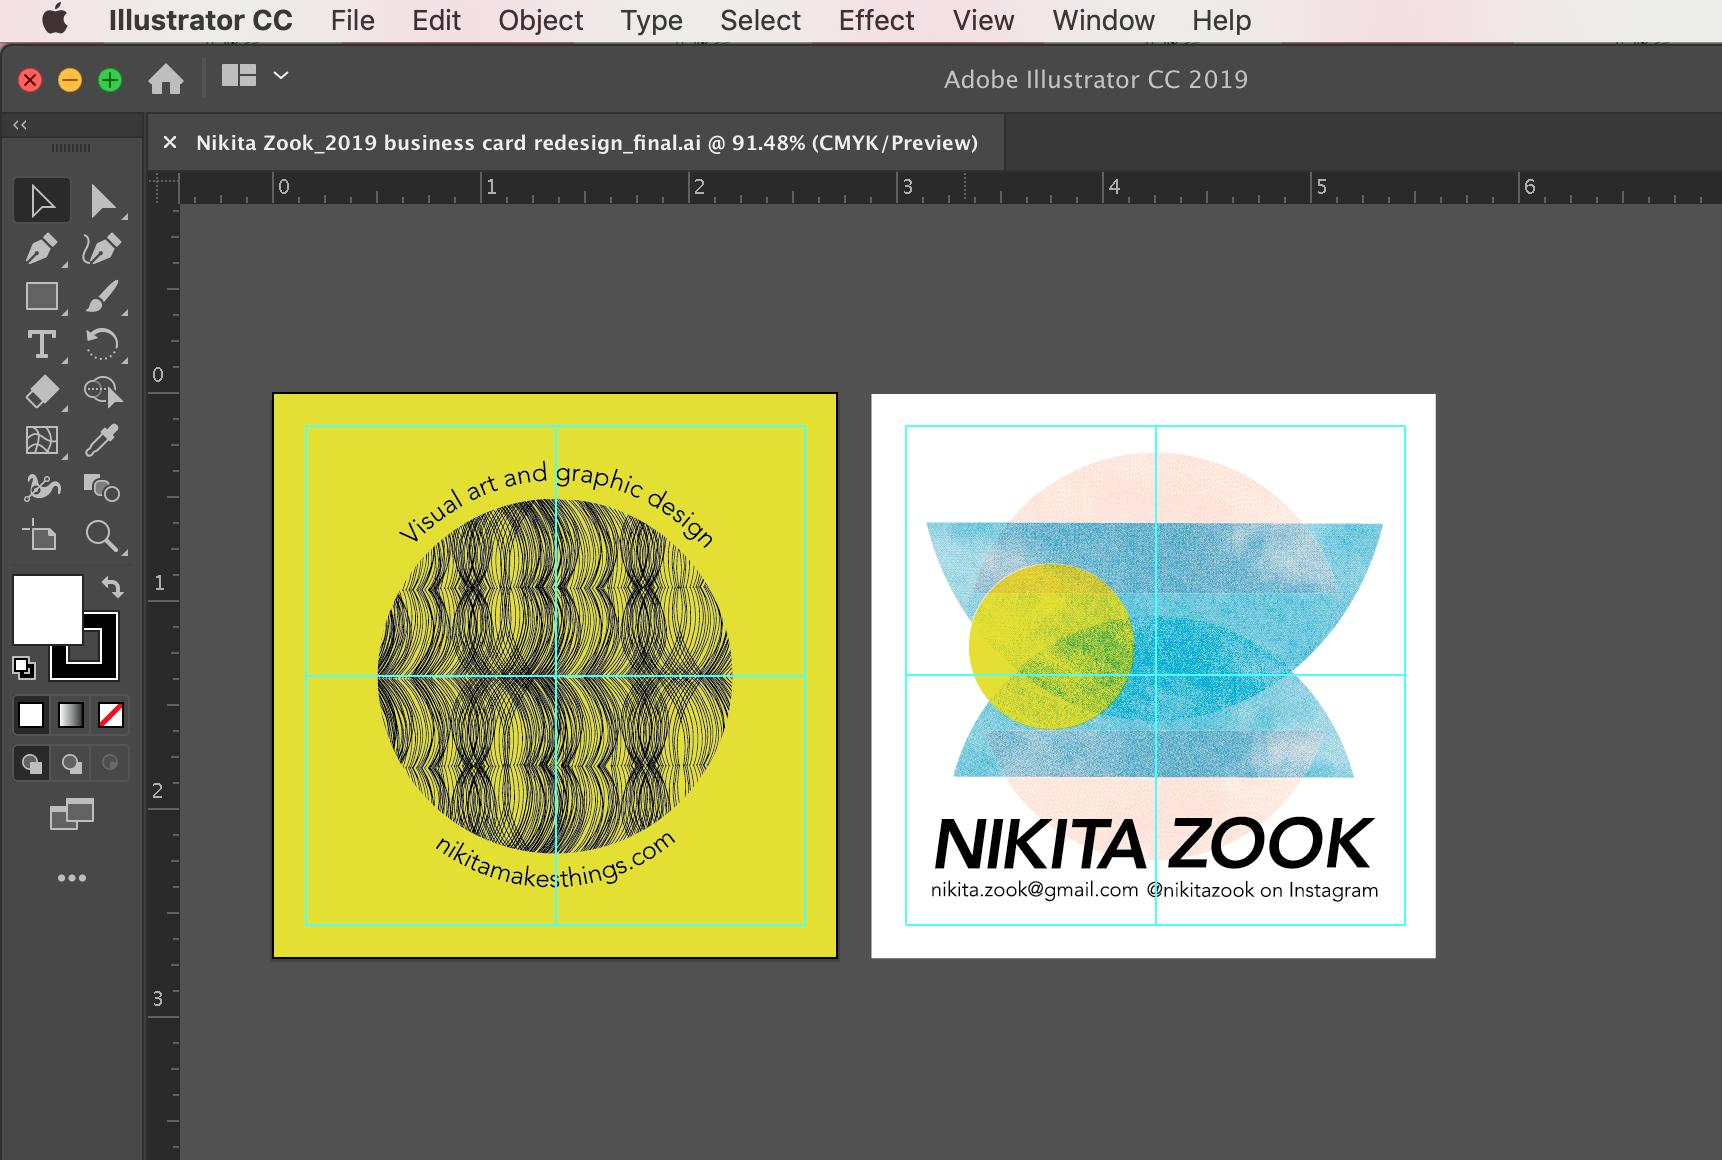 I edit and design using Adobe Illustrator.